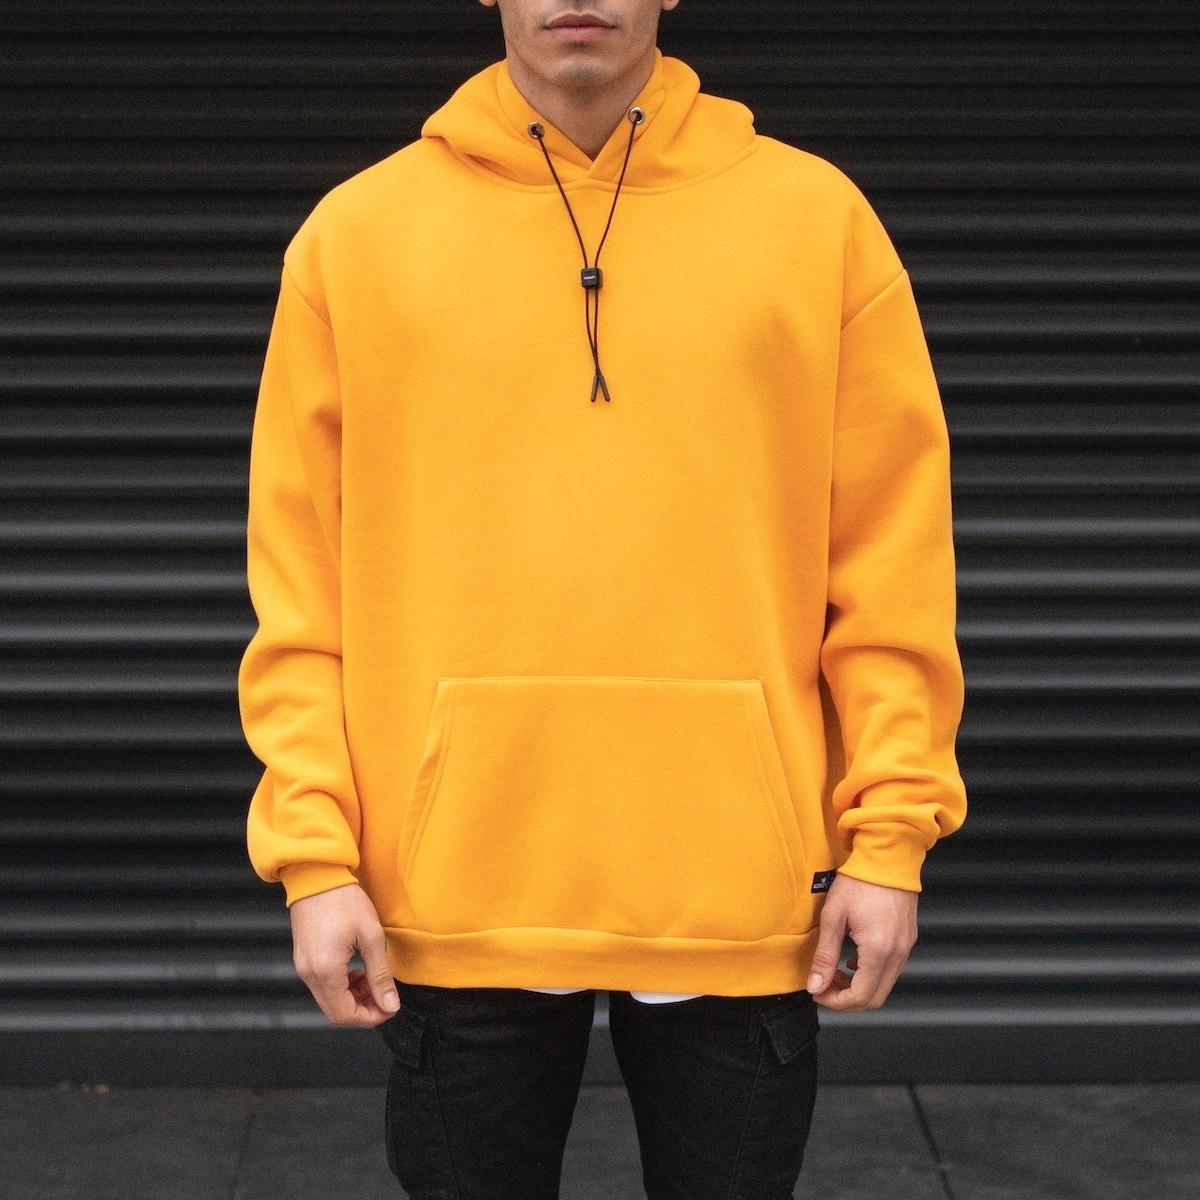 Men's Oversize Basic Hoodie Sweatshirt With Kangaroo Pocket In Mustard